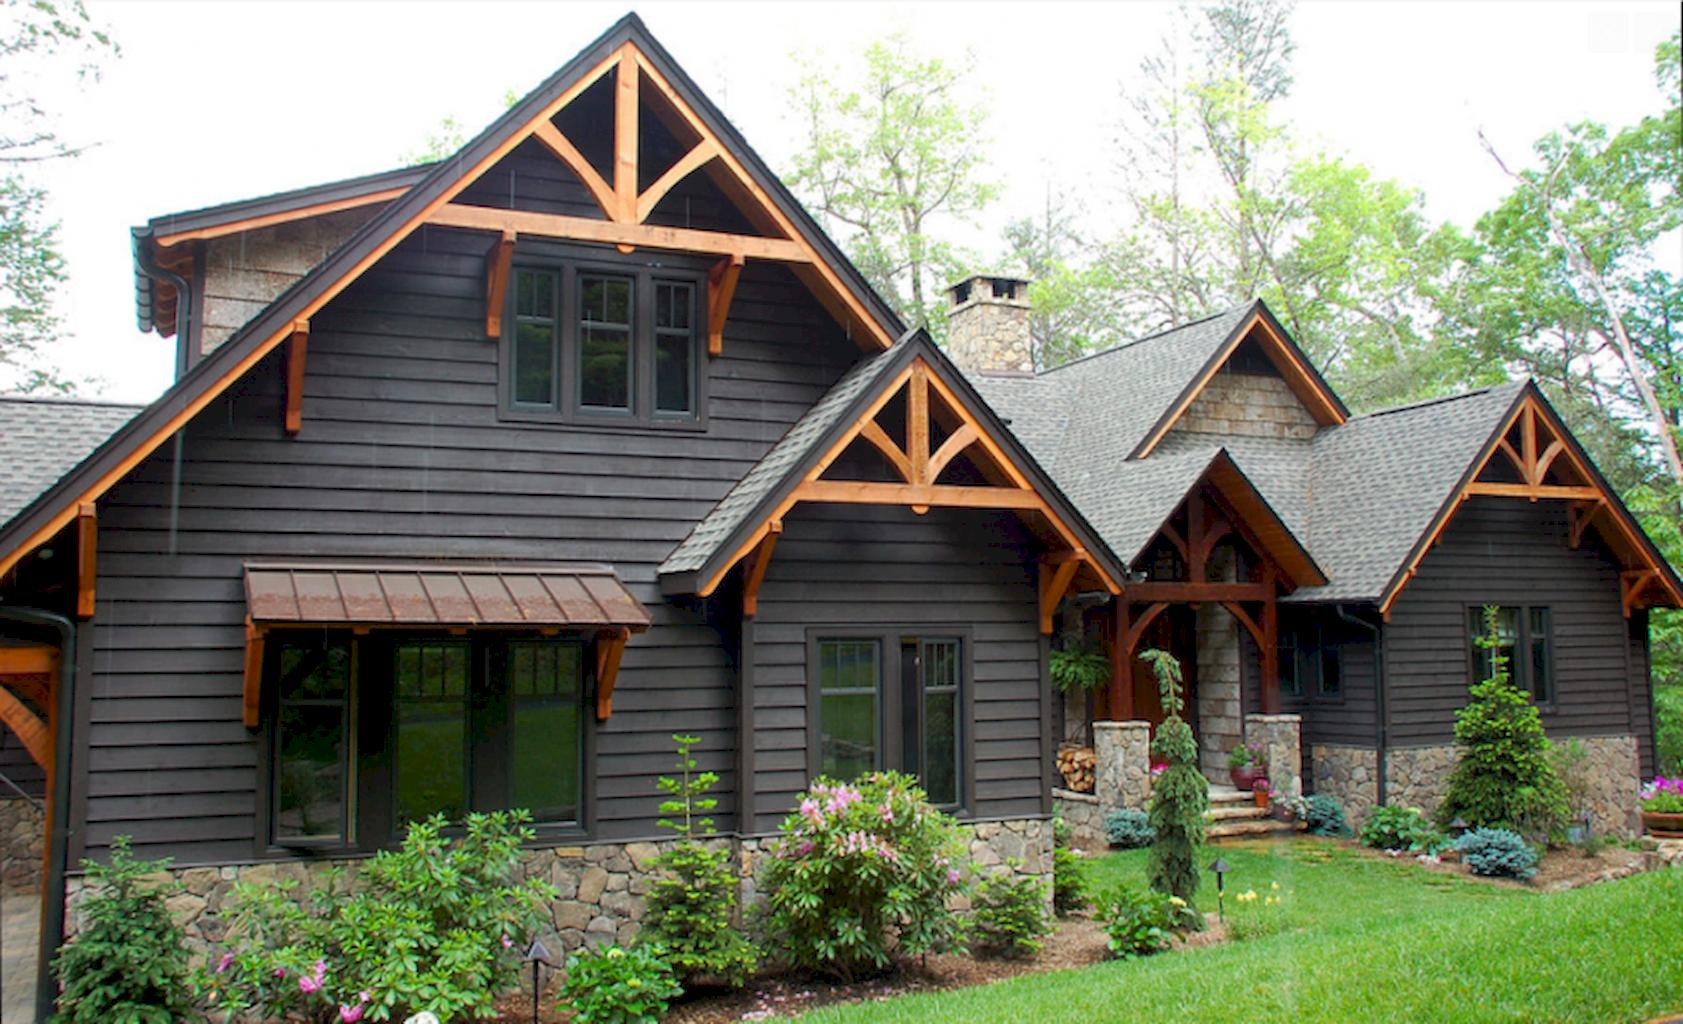 60 rustic farmhouse exterior decor ideas (20) | Addition ...